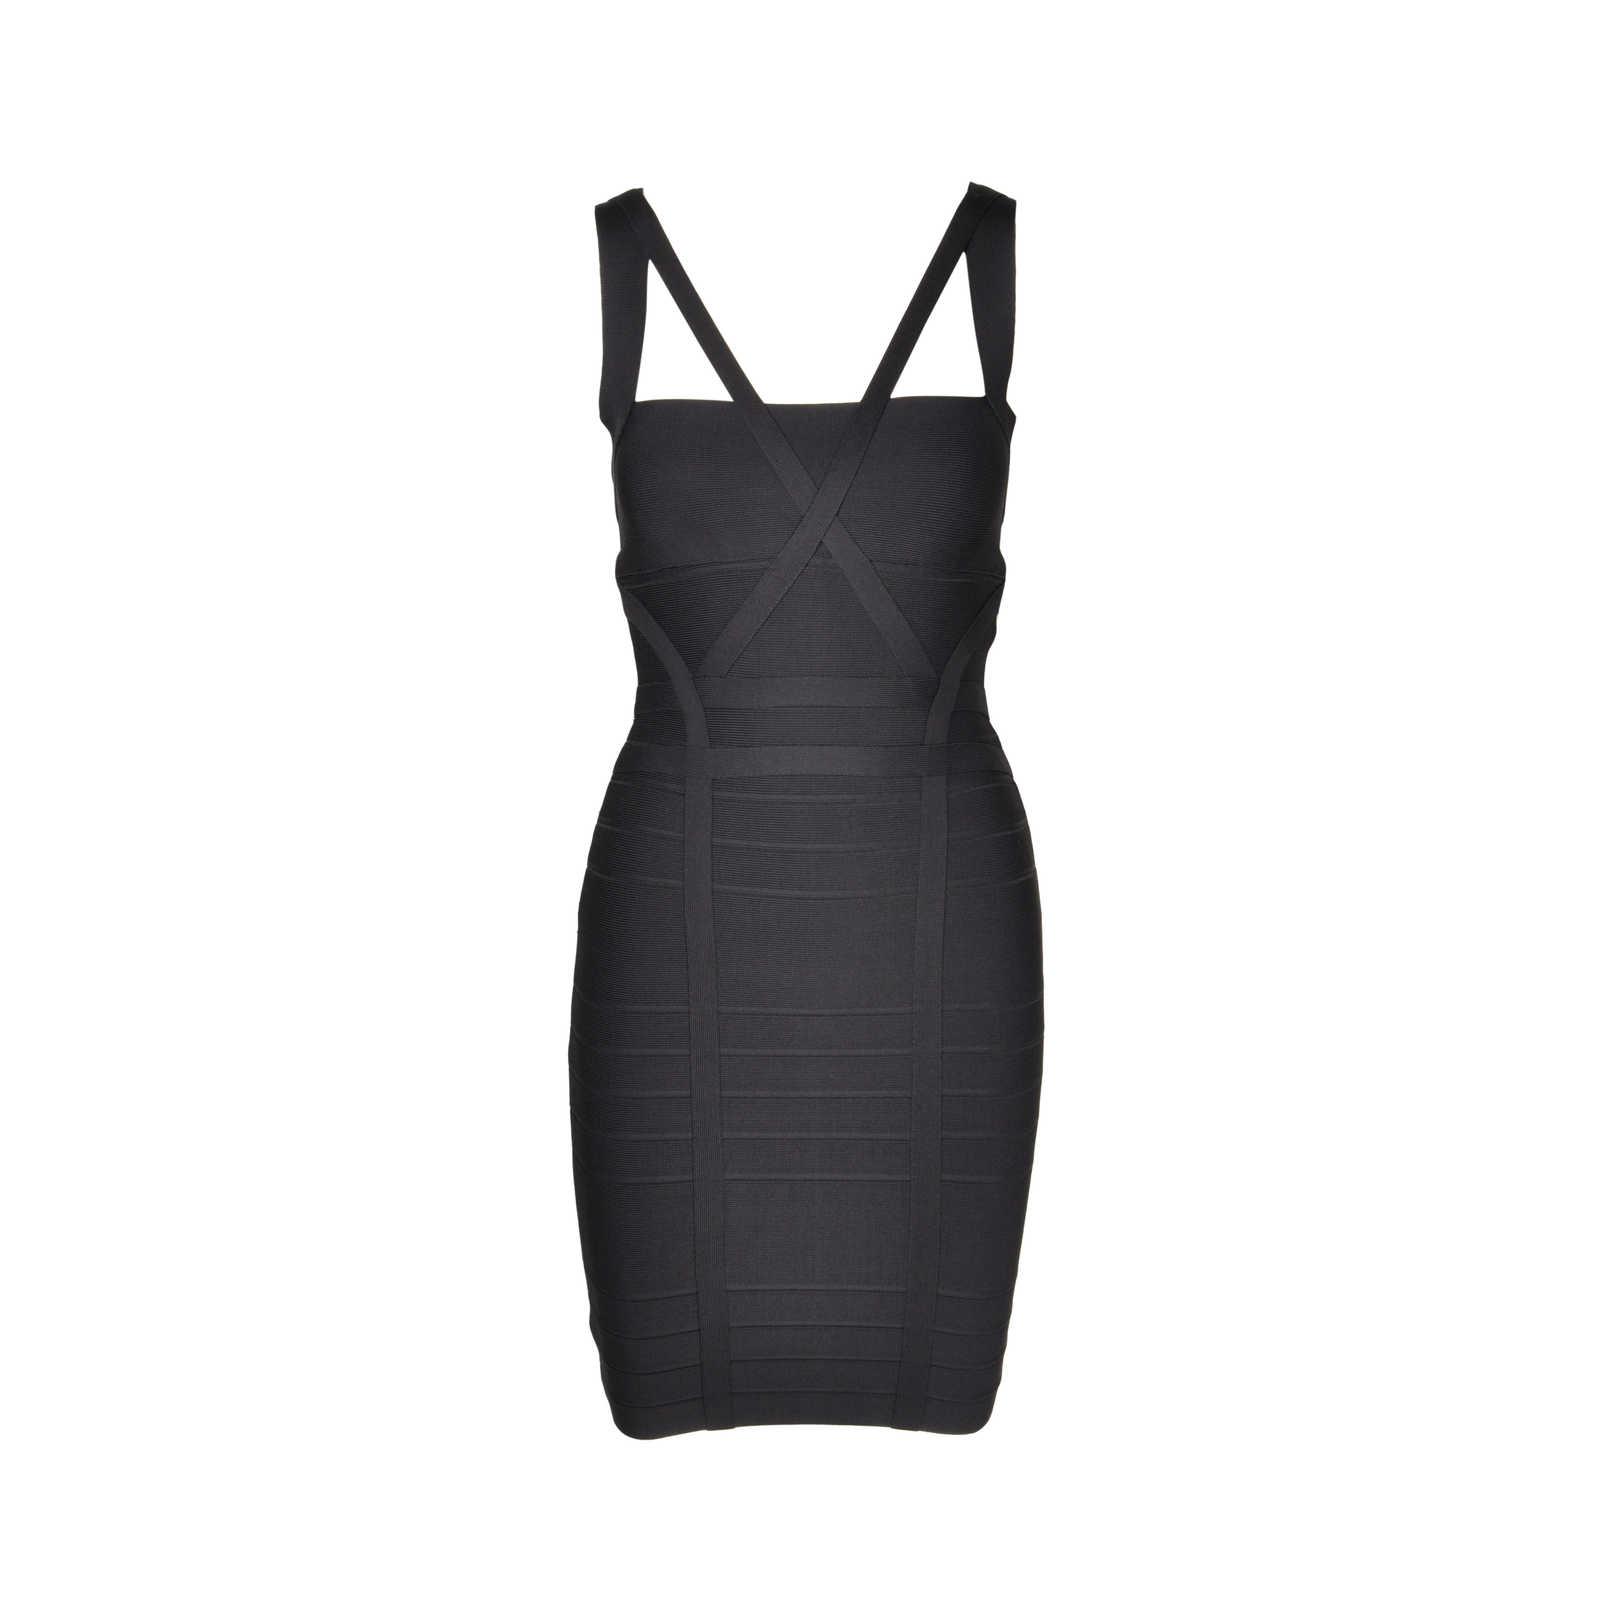 9230a4977736 Authentic Second Hand Hervé Leger Bandage Dress (PSS-075-00066) - Thumbnail  ...